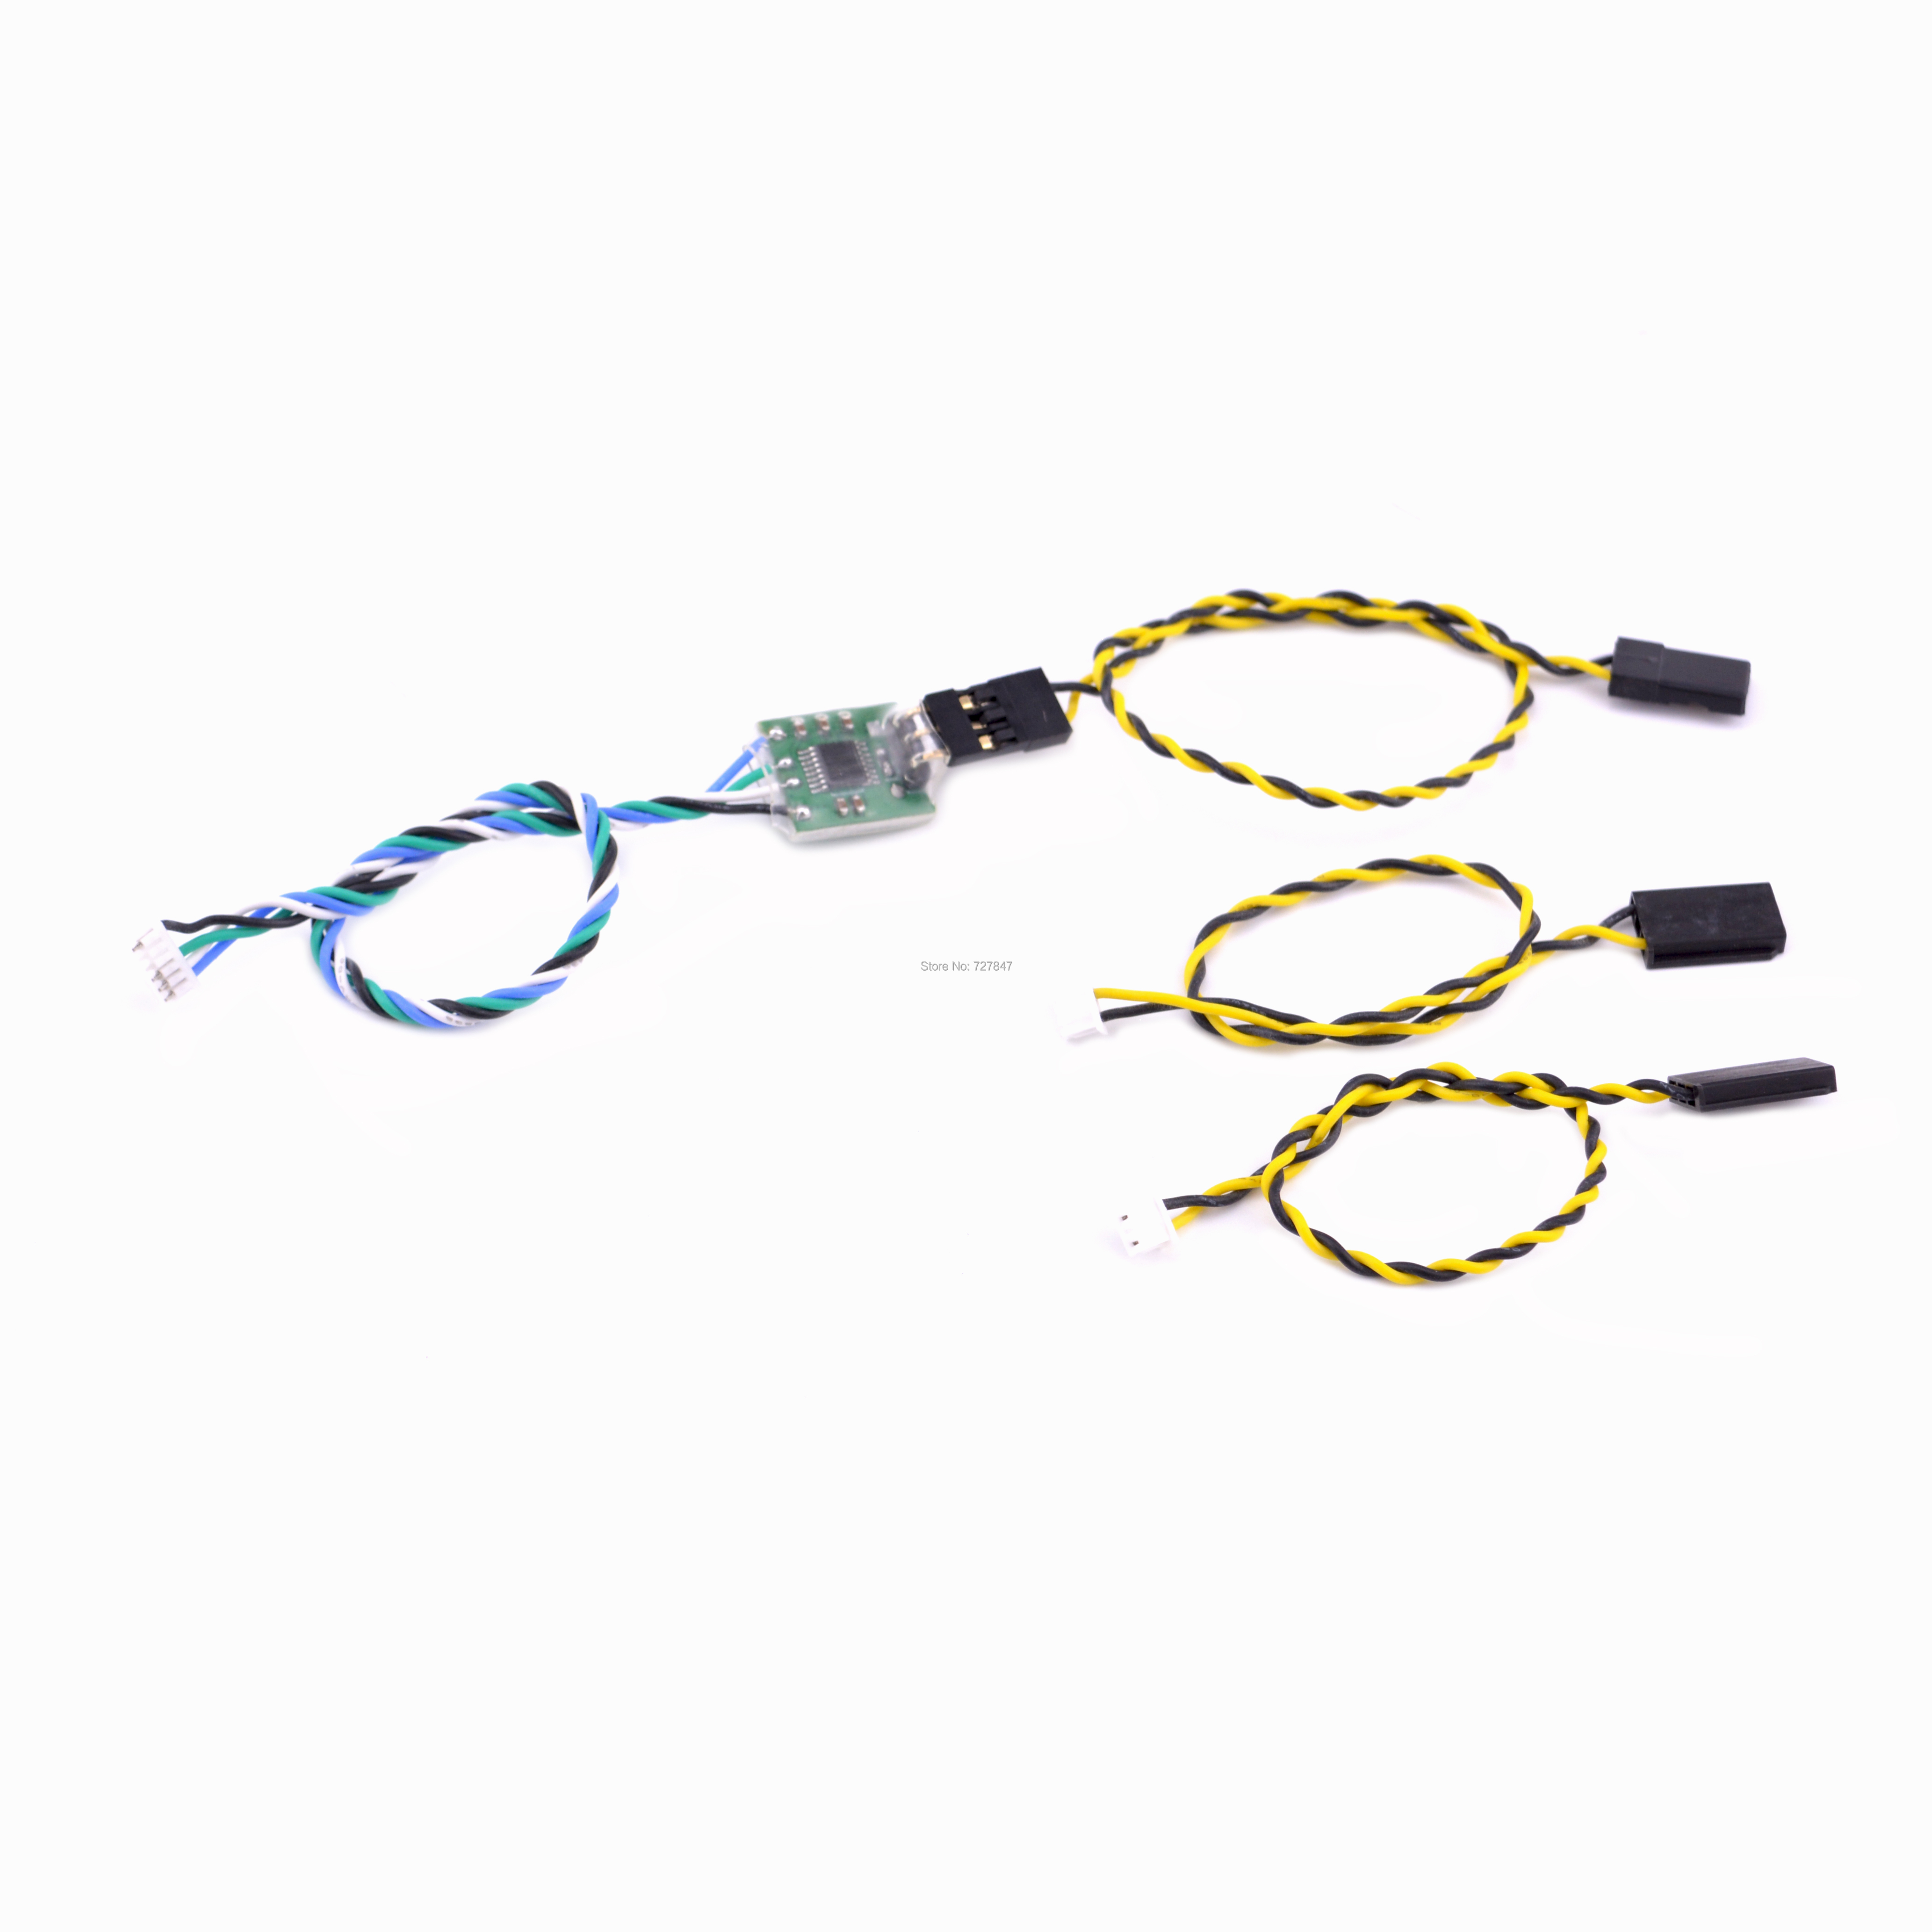 Telemetry Converter Cable Pixhawk to Horus X10S X12S Taranis X9DP QX7/X7S  Smart Port receiver X8R X4RSB R-XSR for Frsky